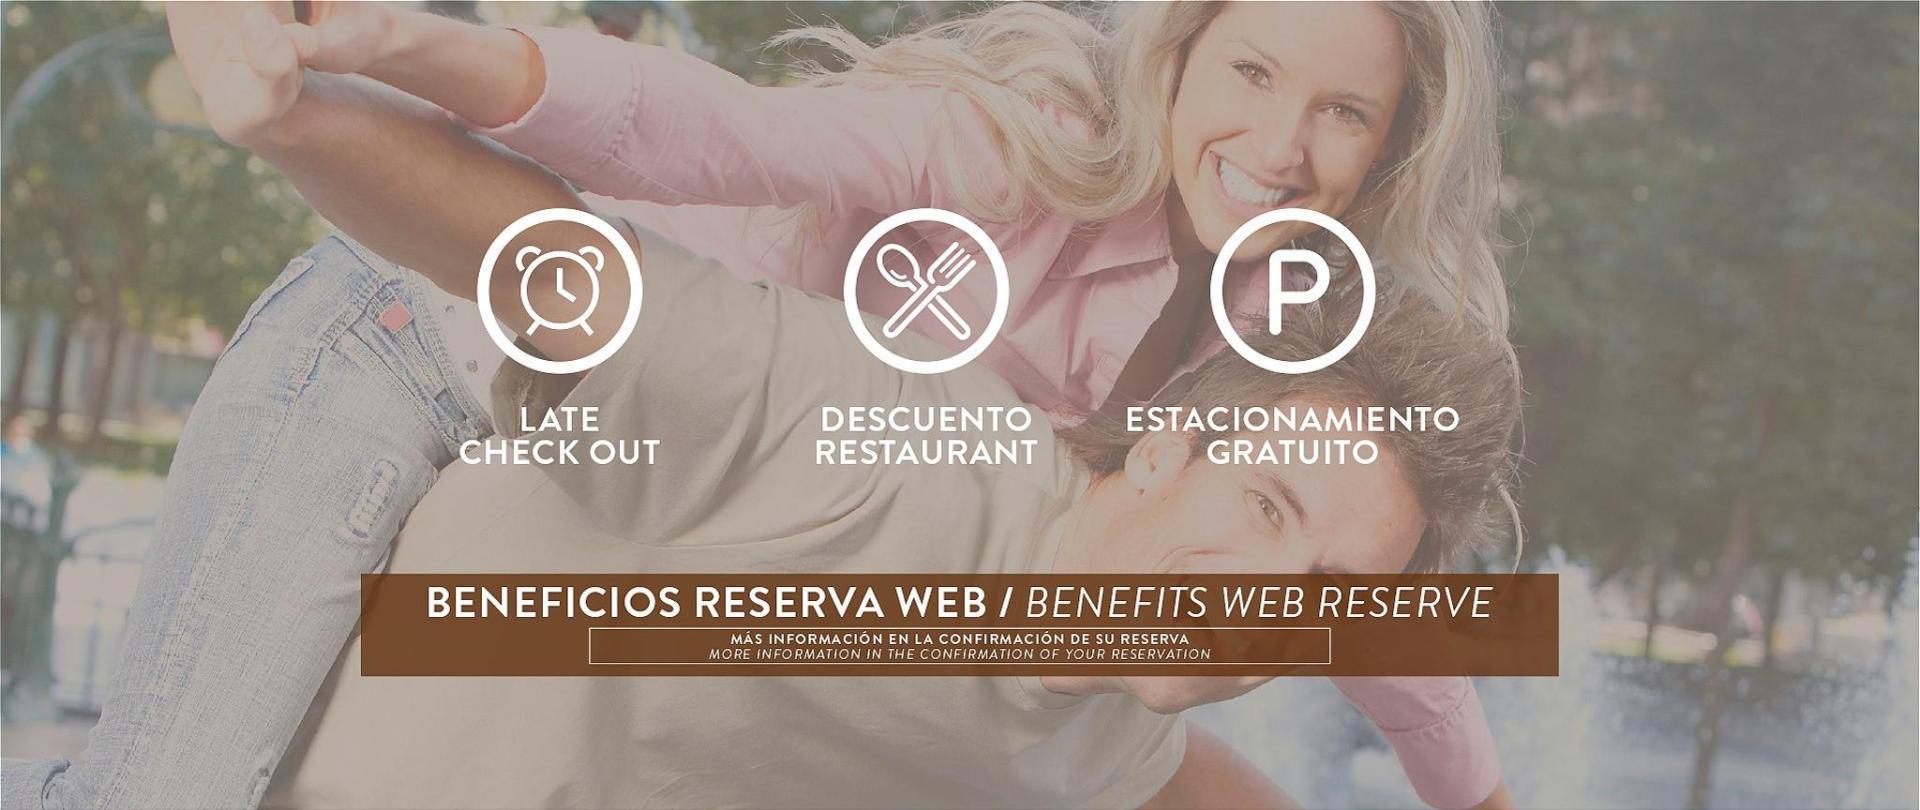 Beneficio Web HG.jpg